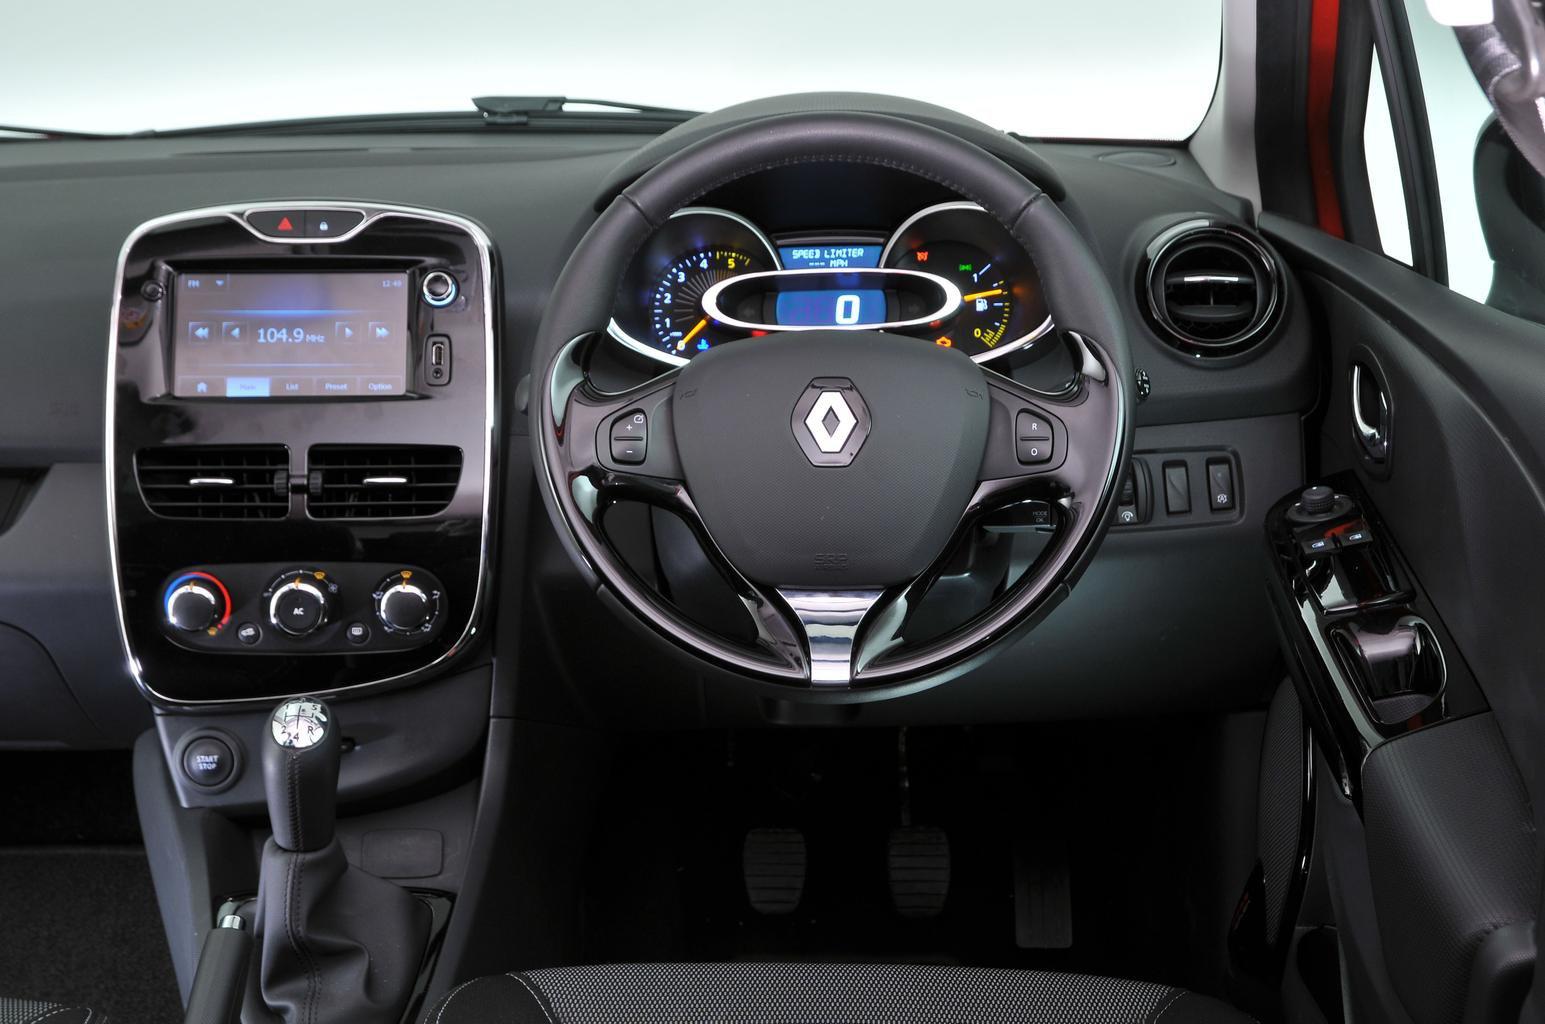 Used test: Ford Fiesta vs Hyundai i20 vs Renault Clio